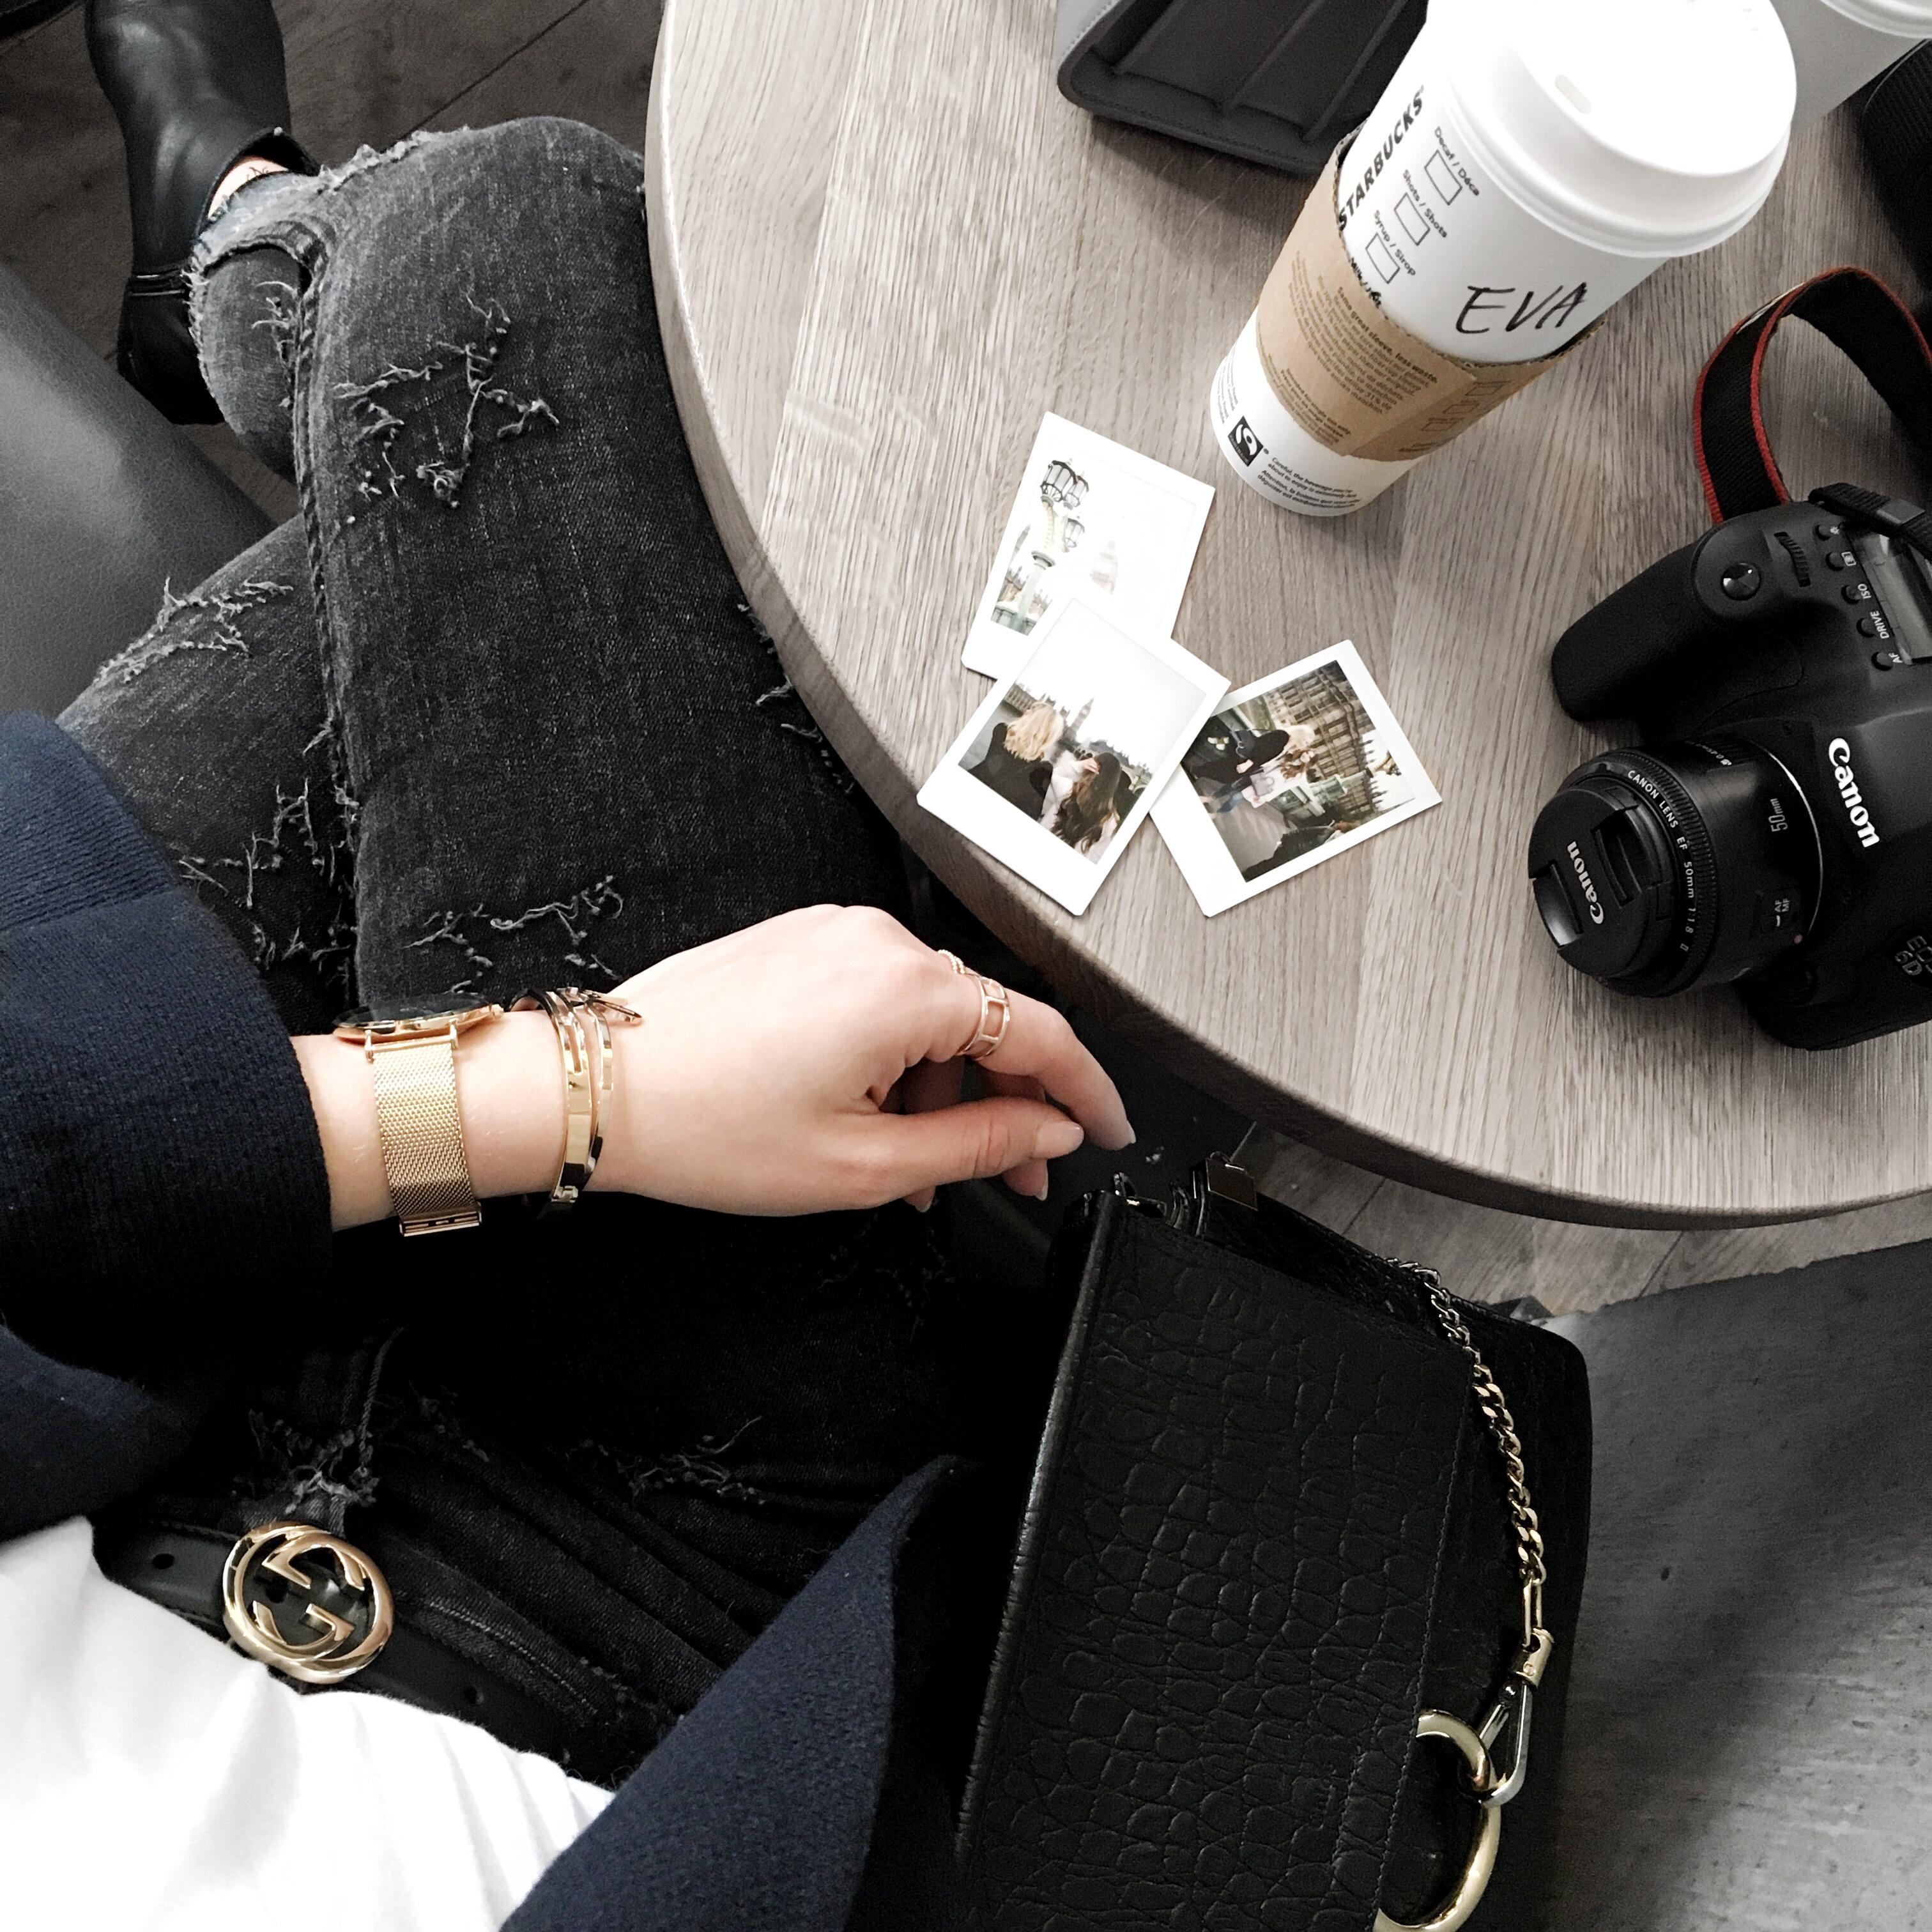 Eva-Jasmin-friendship-london-fashion-week-details-gucci